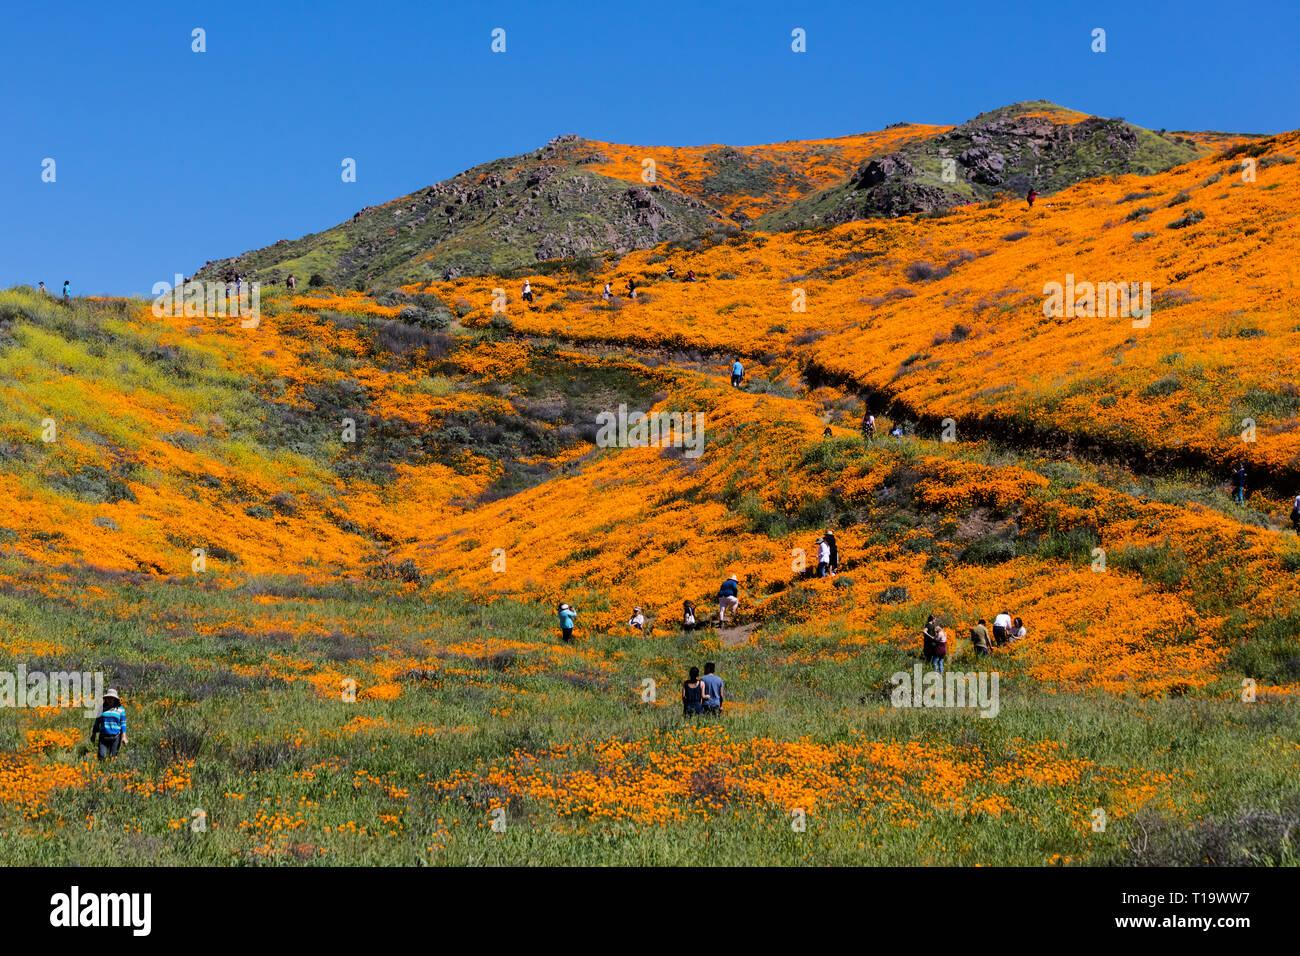 CALIFORINA POPPIES (Eschscholzia californica) cover the hillsides during a super bloom near LAKE ELSINORE, CALIFORNIA - Stock Image